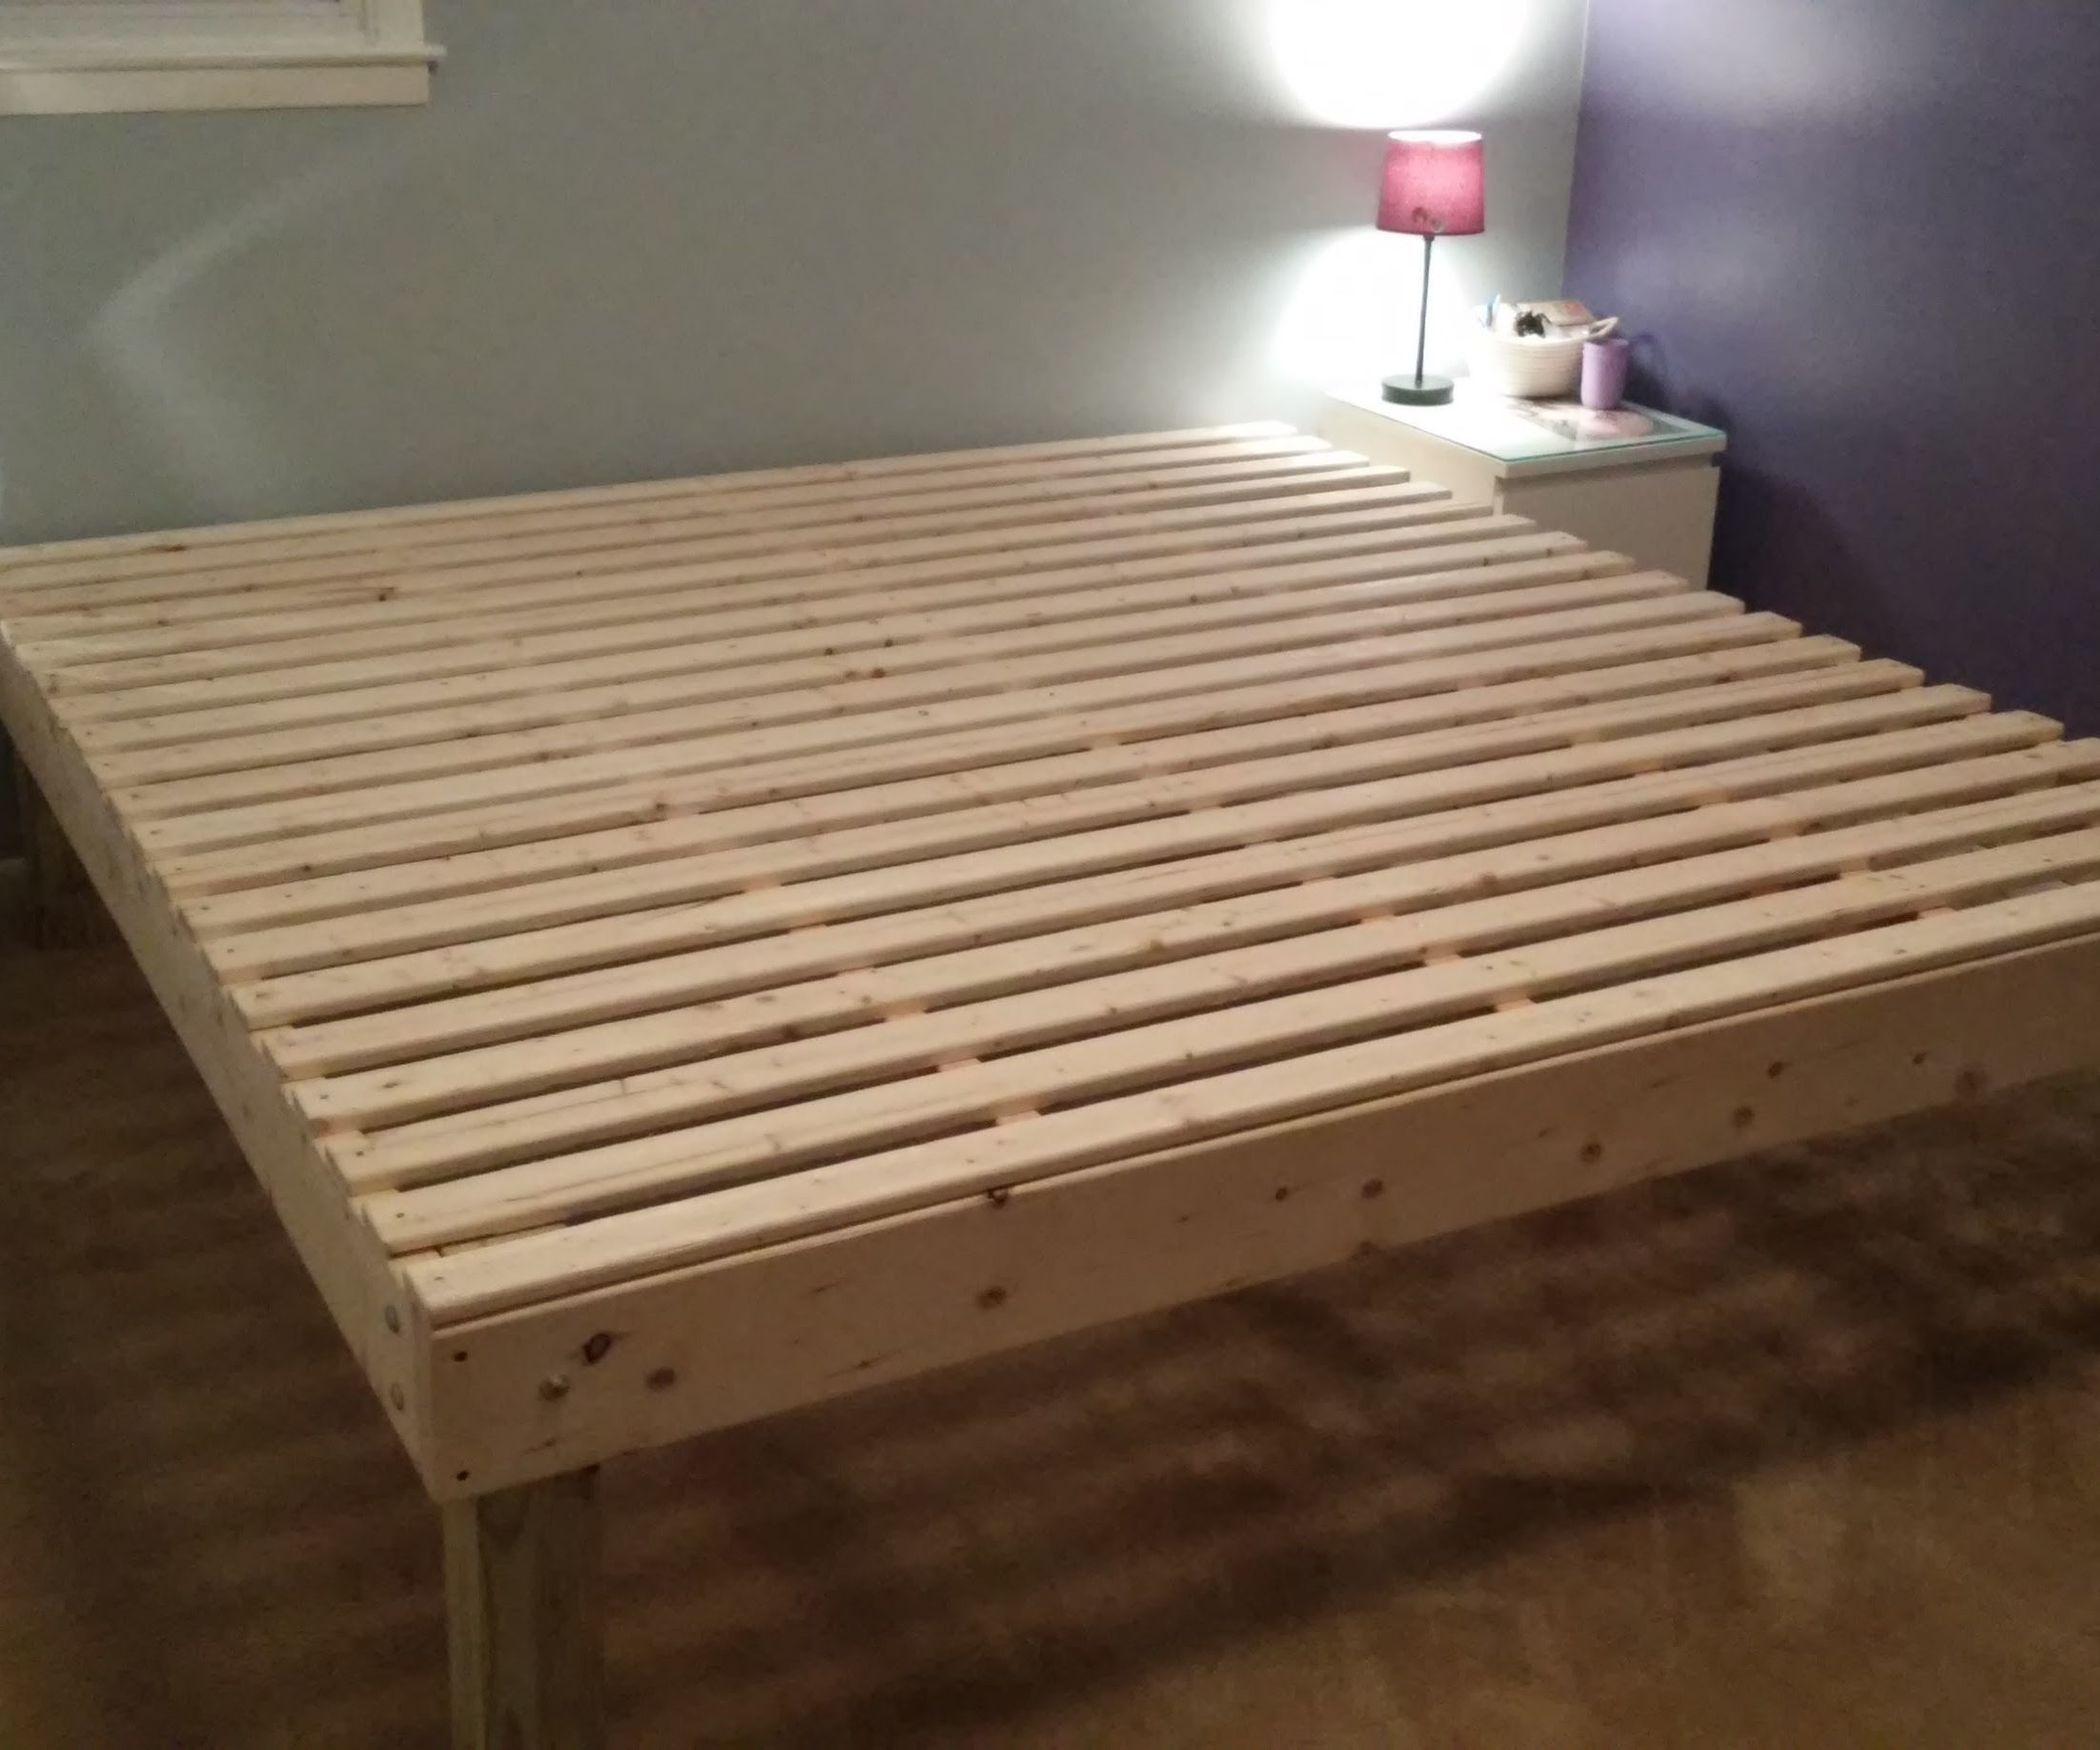 Foam Mattress Bed Frame For Under 100 Foam Mattress Bed Frame Bed Frame Mattress Foam Mattress Bed